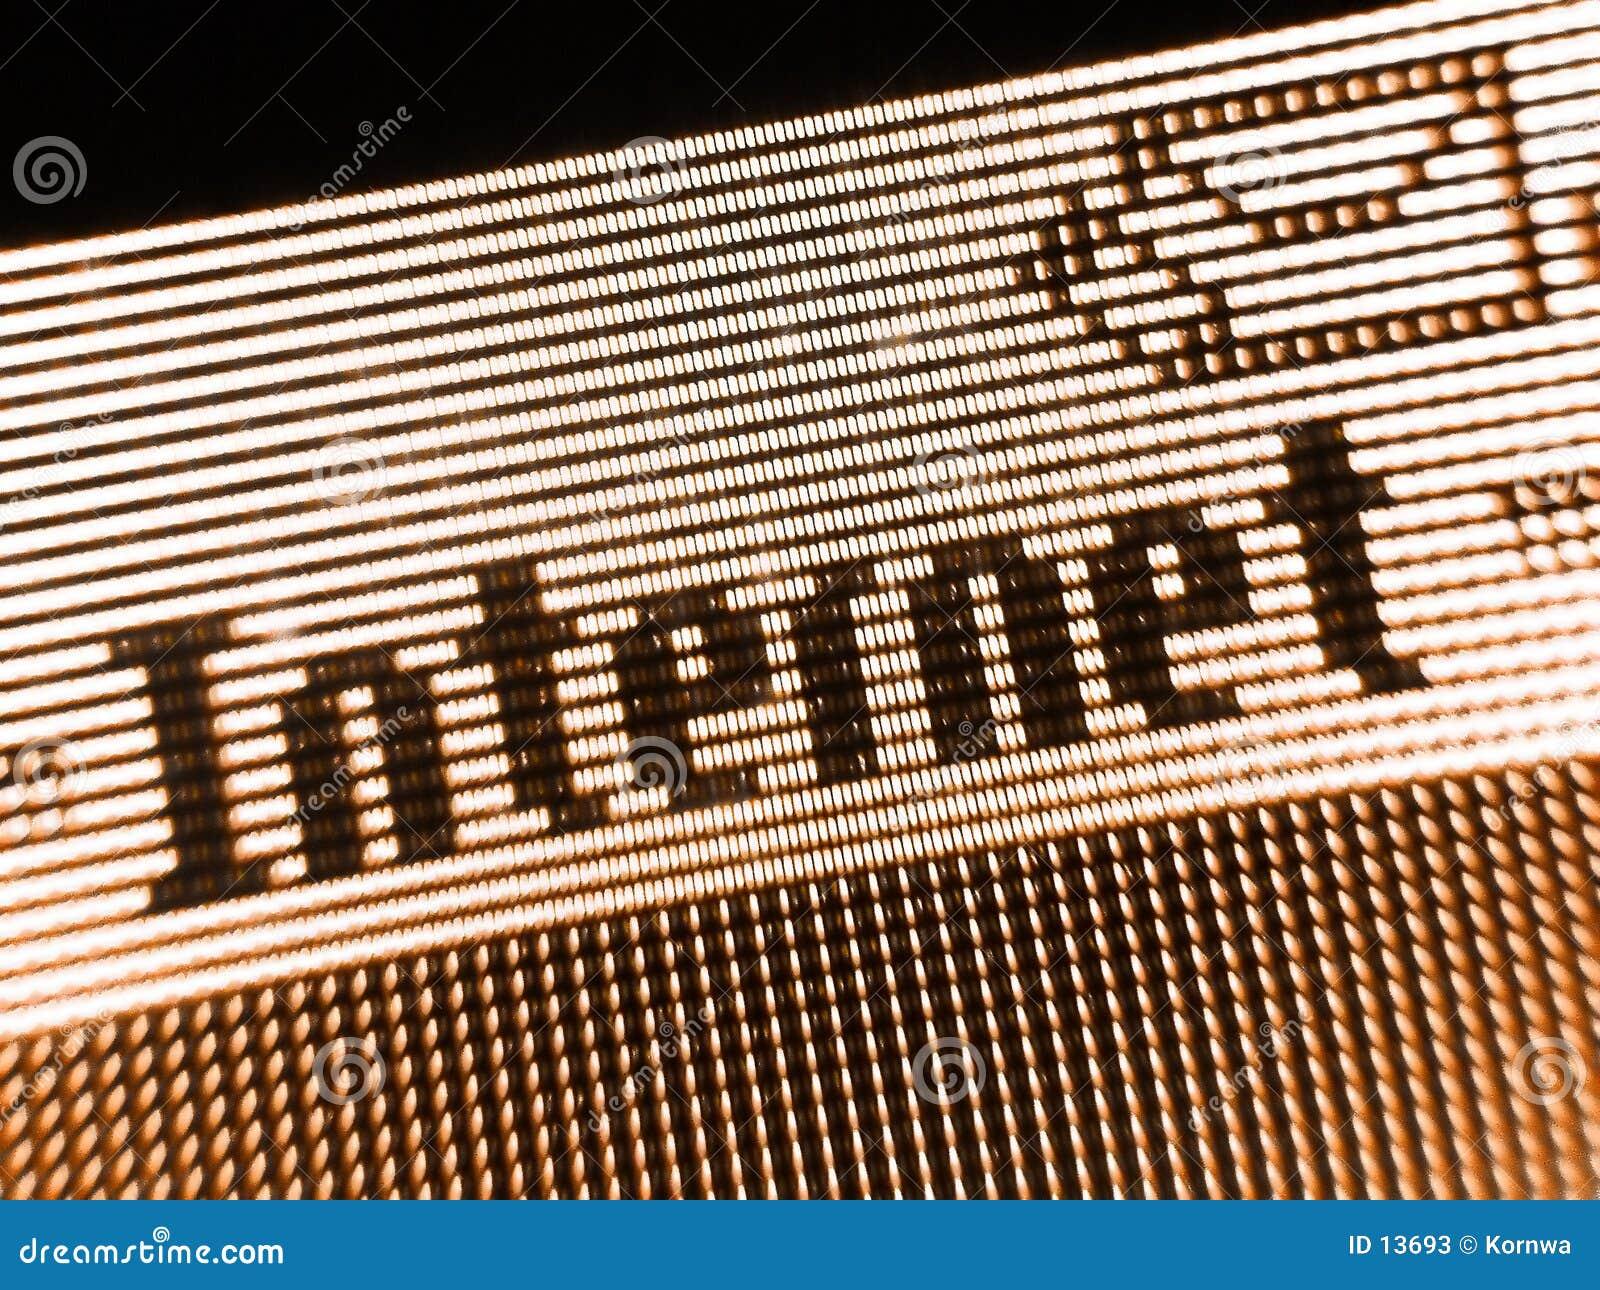 Internet screen